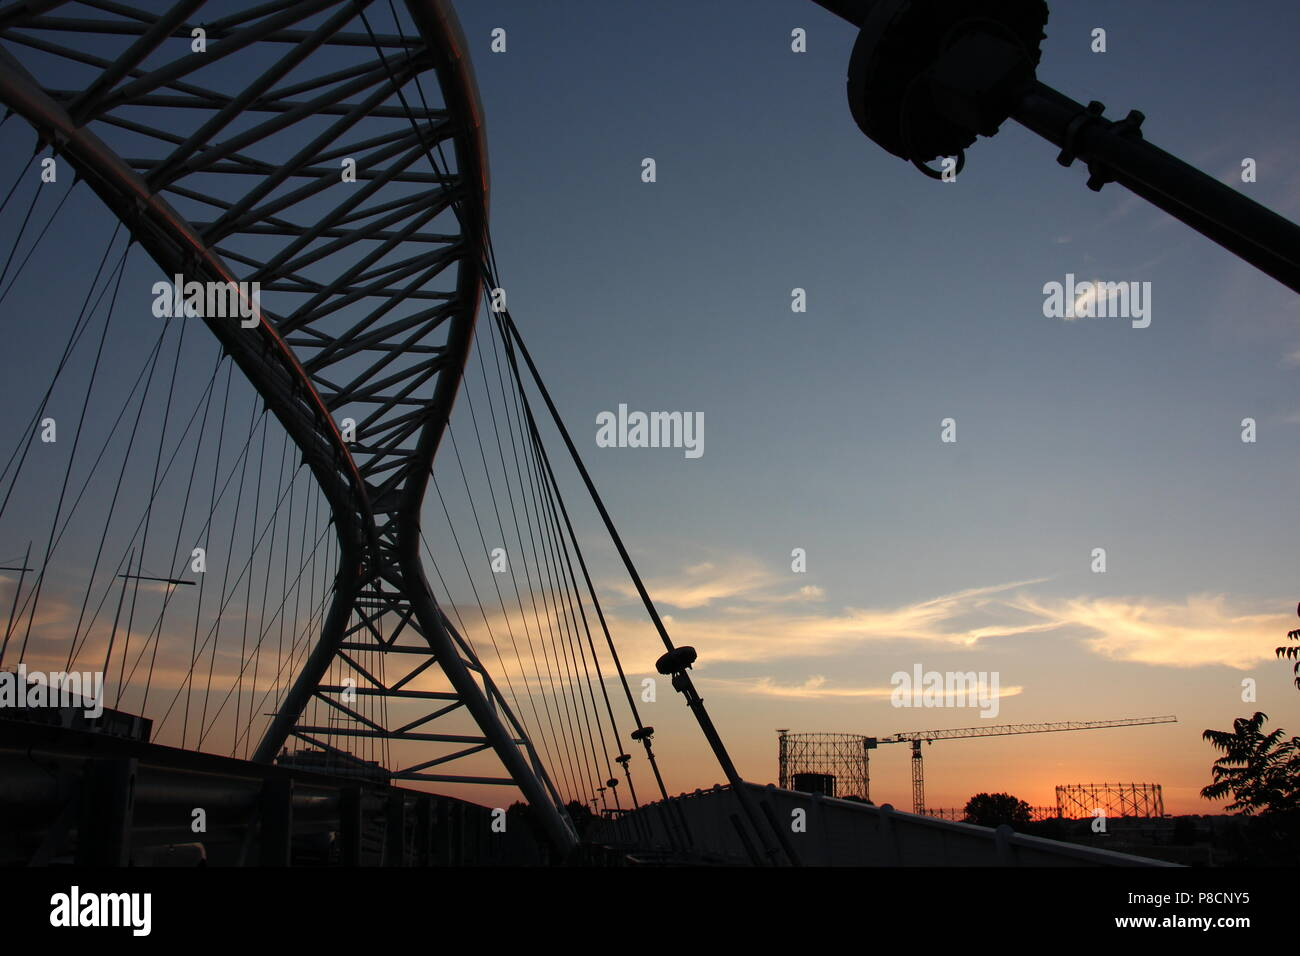 Rome, Italy. 10th July 2018. Beautiful sunset in Rome seen from the Garbatella district and Ponte Settimia Spizzichino bridge Credit: Gari Wyn Williams/Alamy Live News Stock Photo